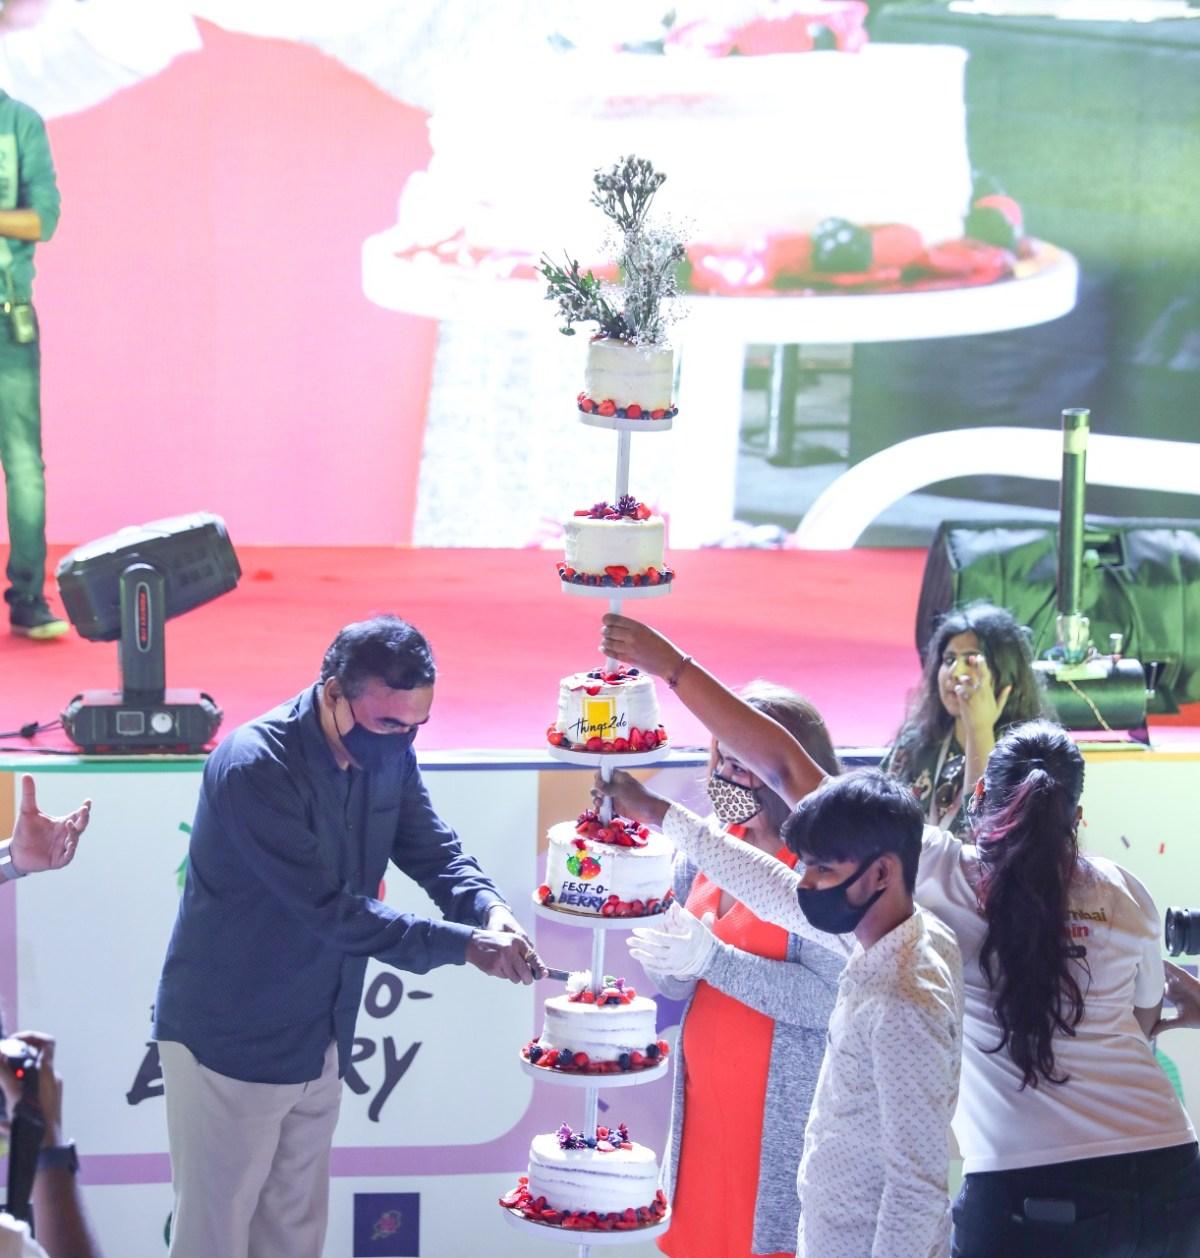 MUMBAI FESTIVAL: MUMBAIKARS ENJOY A 'BERRY-BLAST' AT FEST-O-BERRY